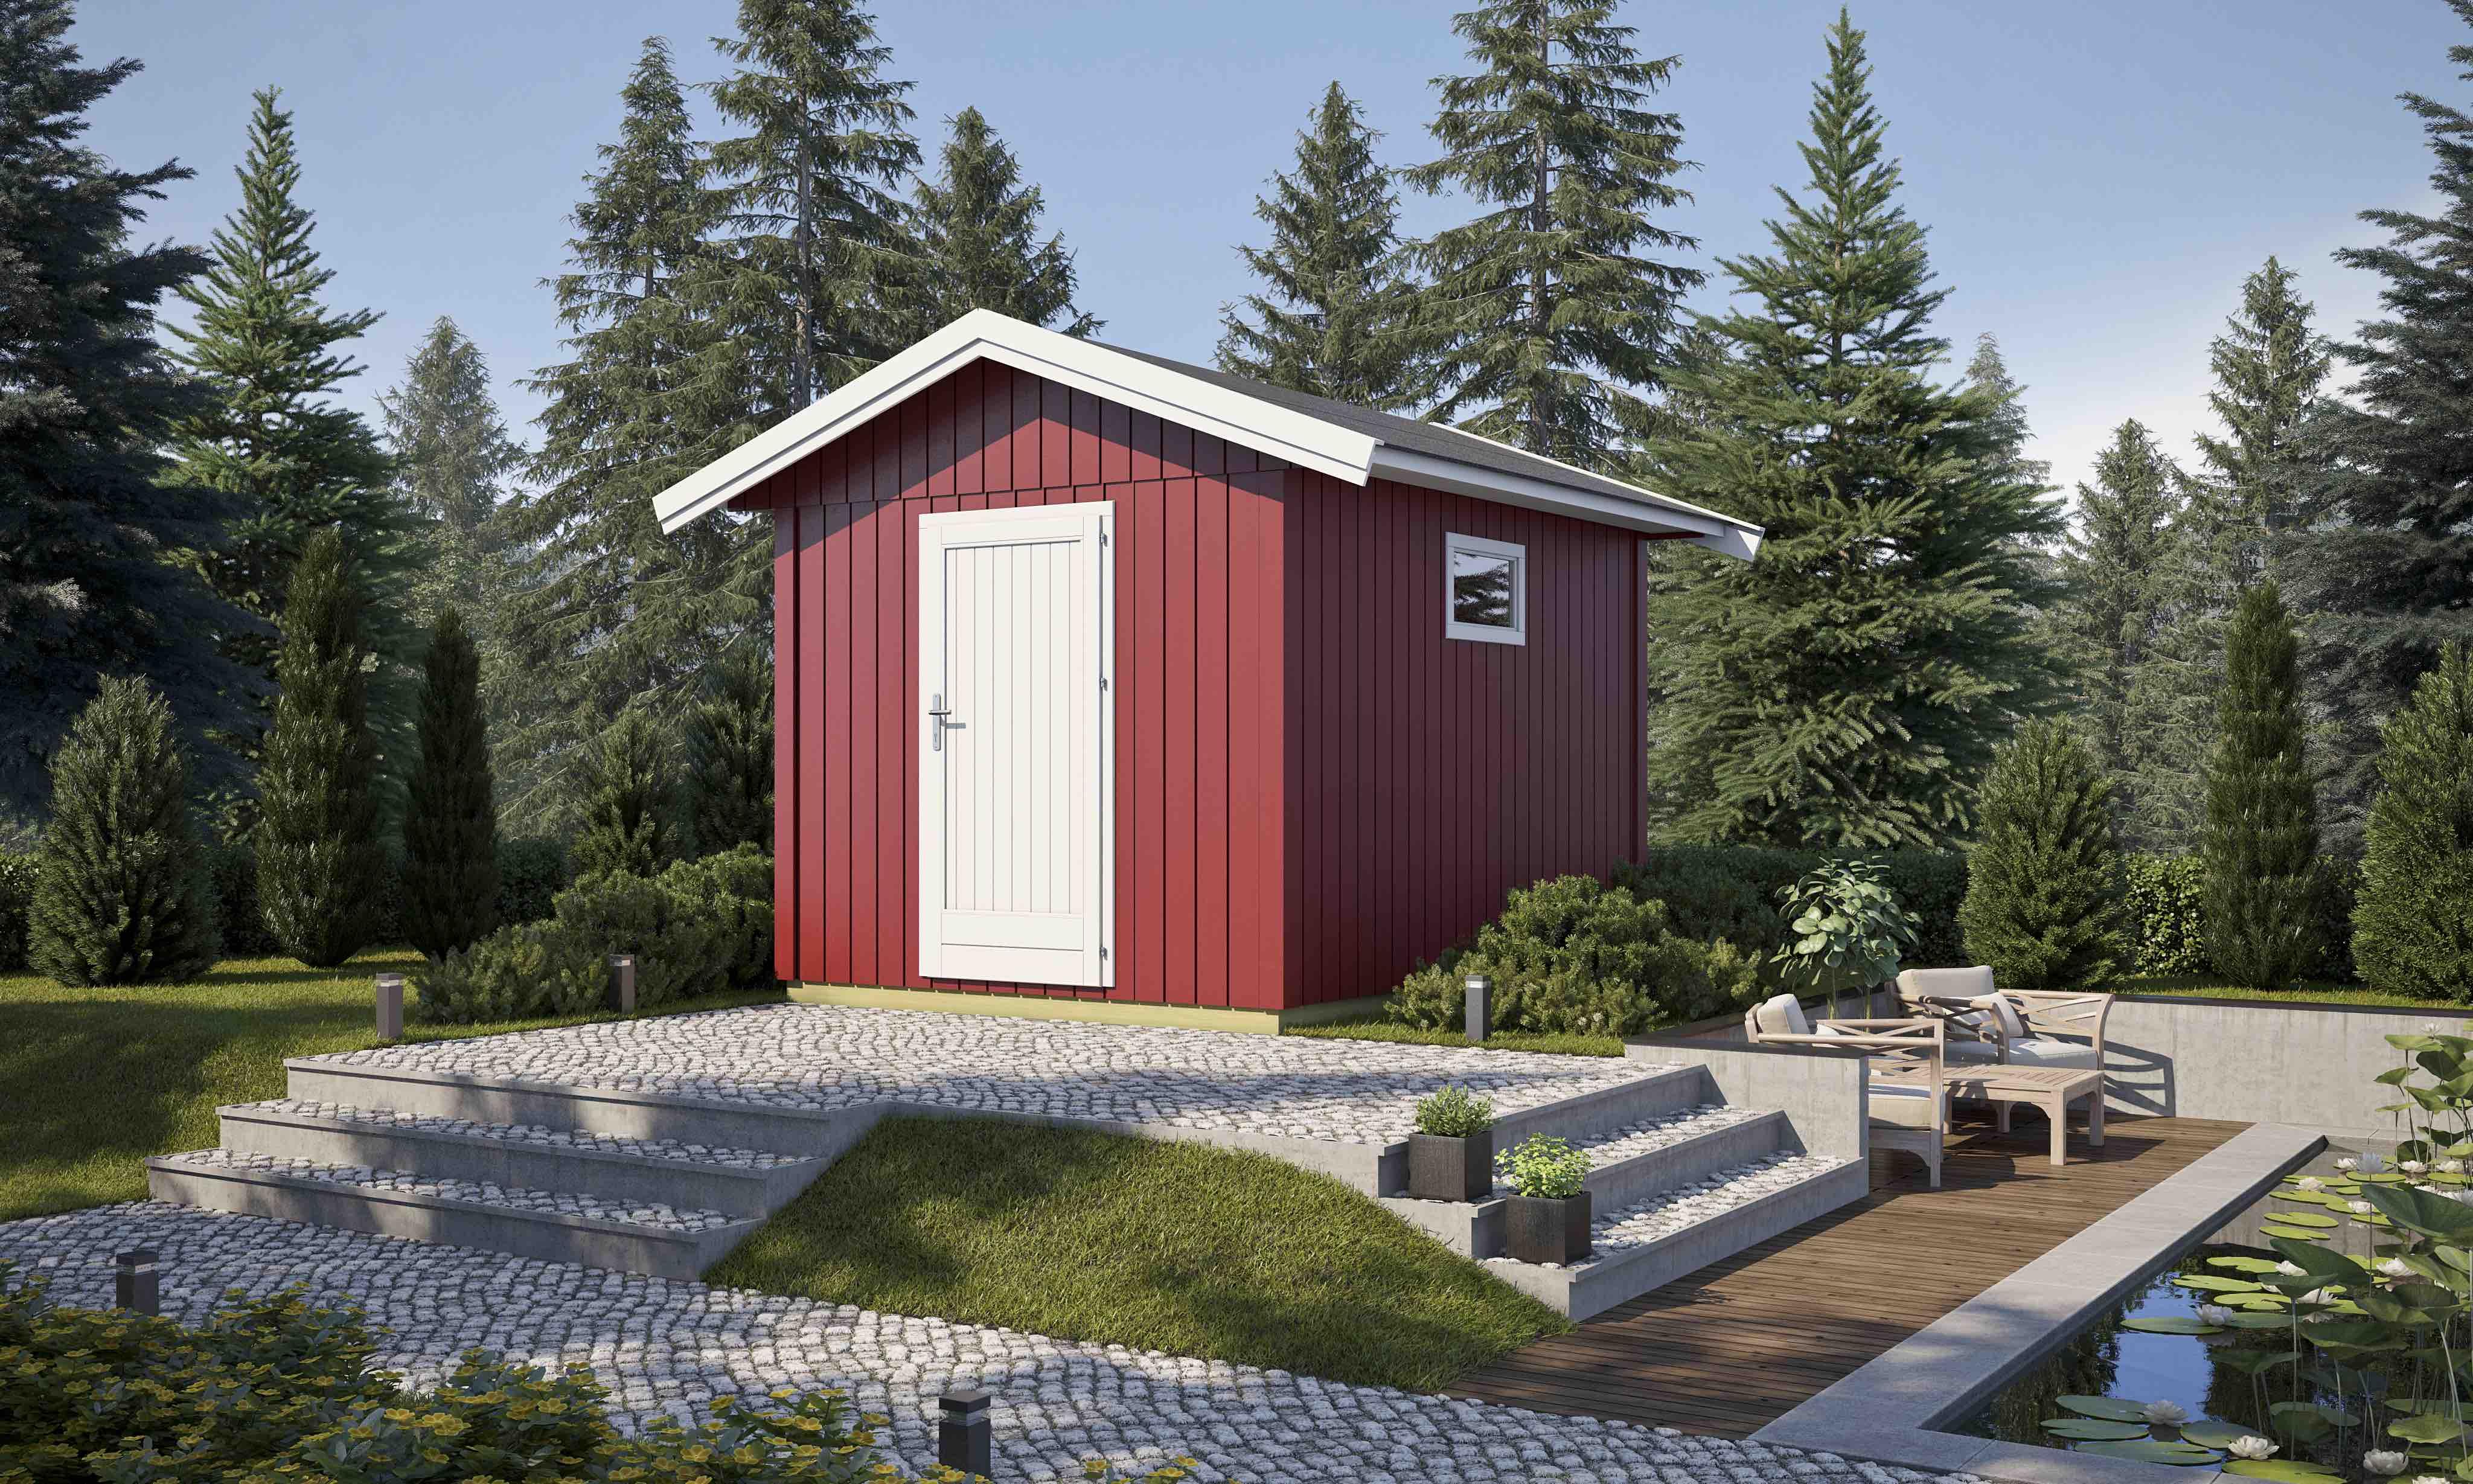 Gartenhaus Nordic 8 Elementhaus 238x334 Cm Gerätehaus Holzhaus